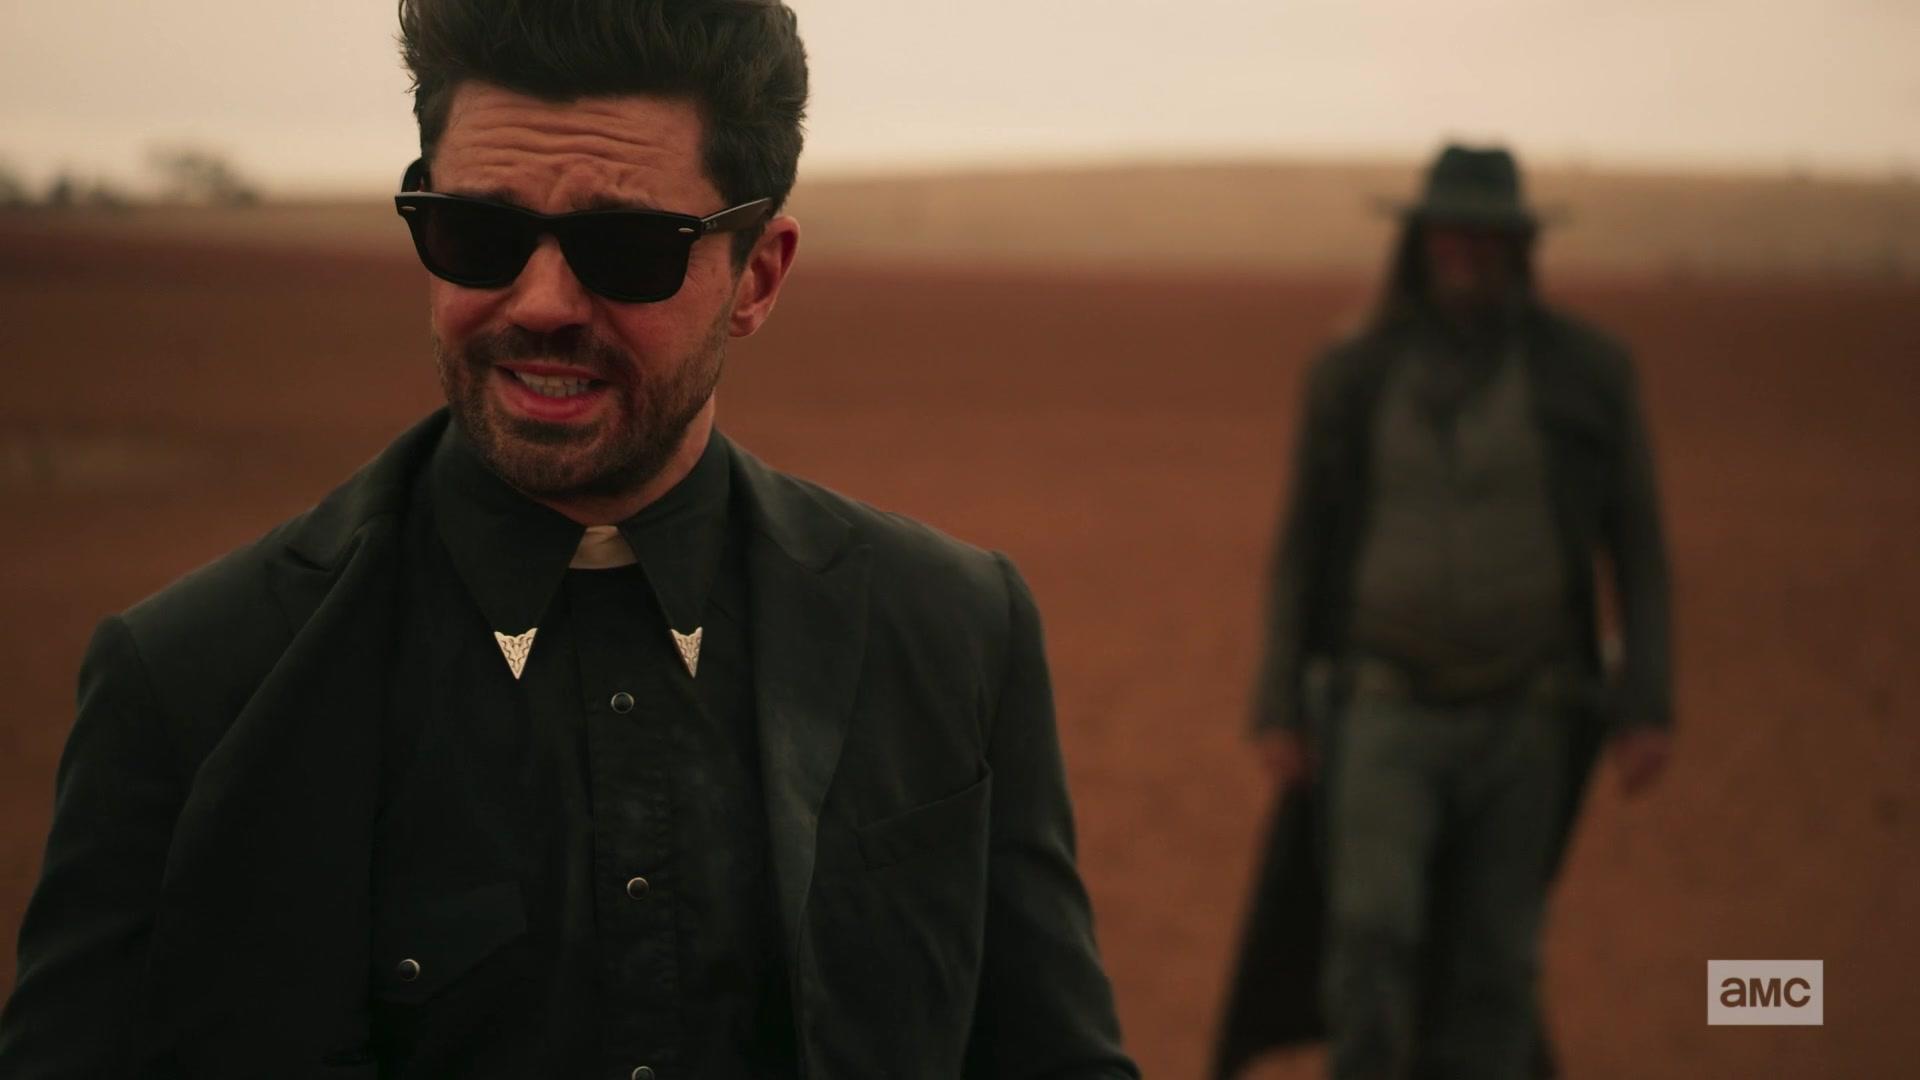 Ray-Ban Wayfarer Sunglasses Worn by Dominic Cooper as Jesse